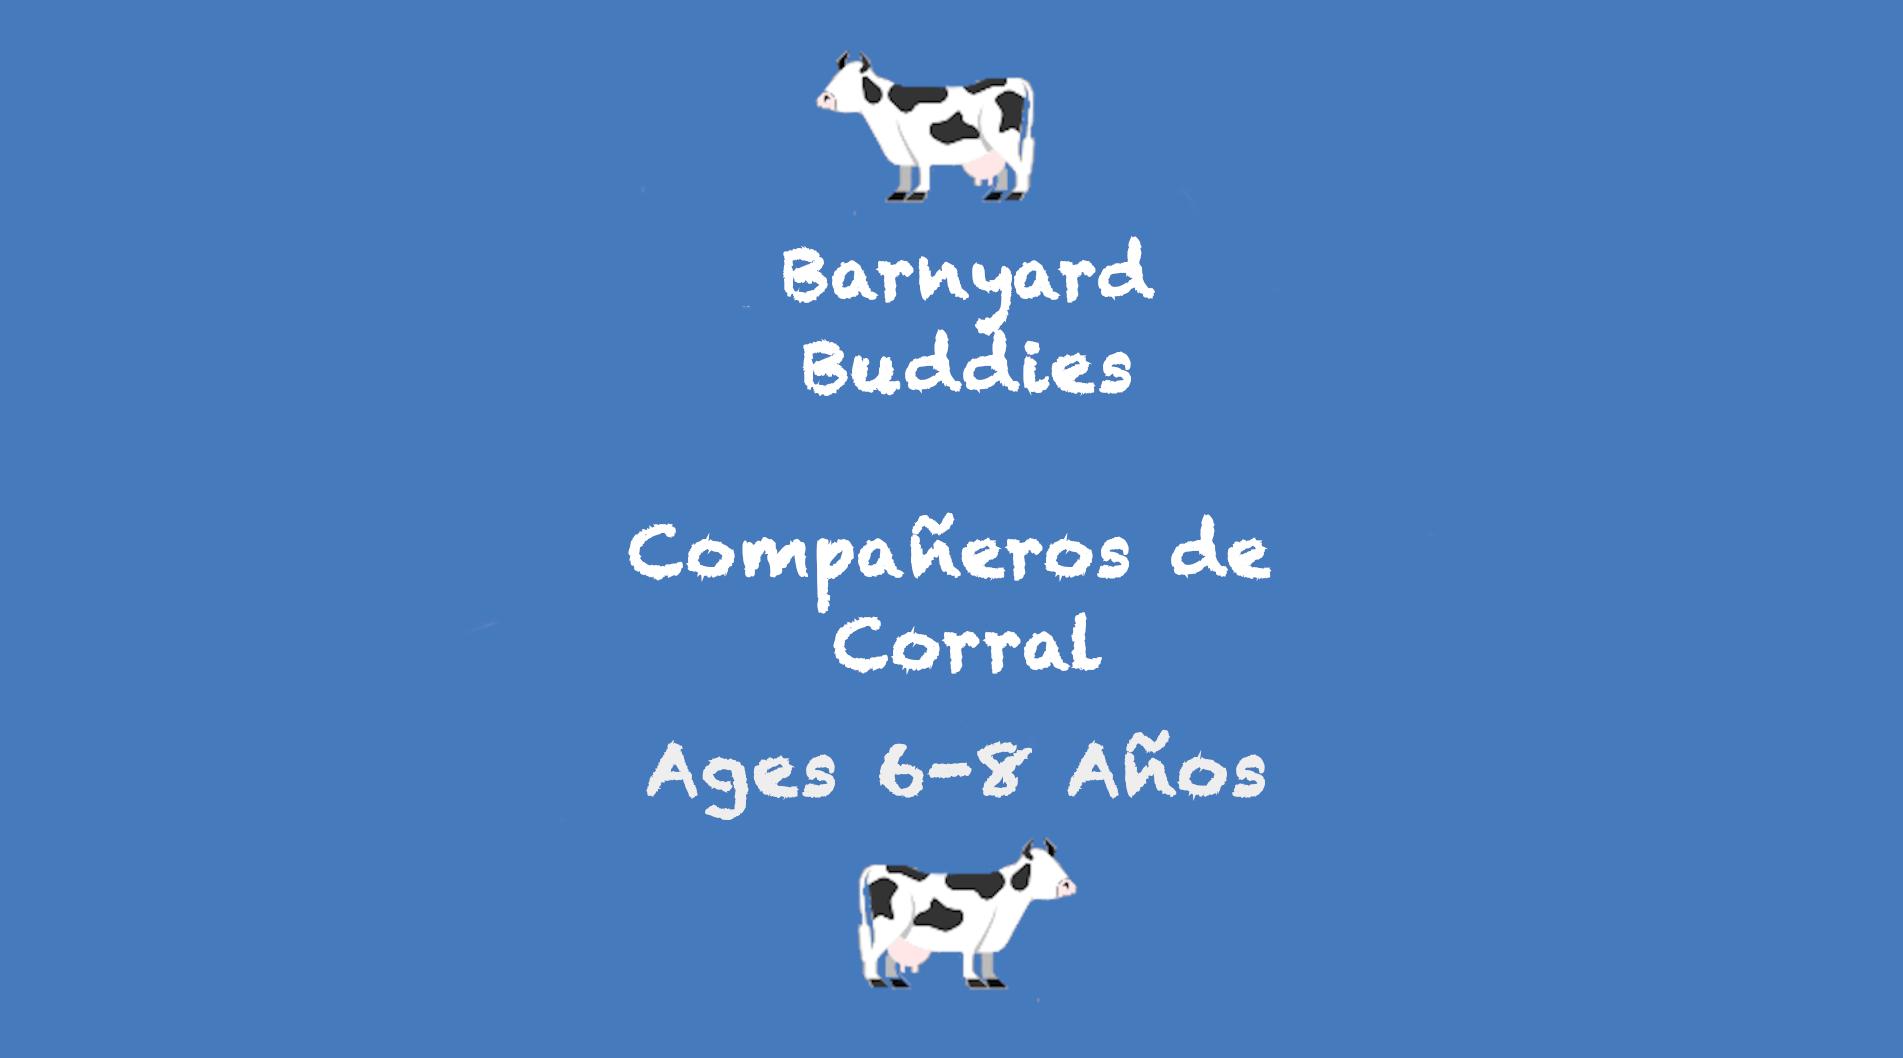 Week 8 Barnyard Buddies Card Ages 6-8